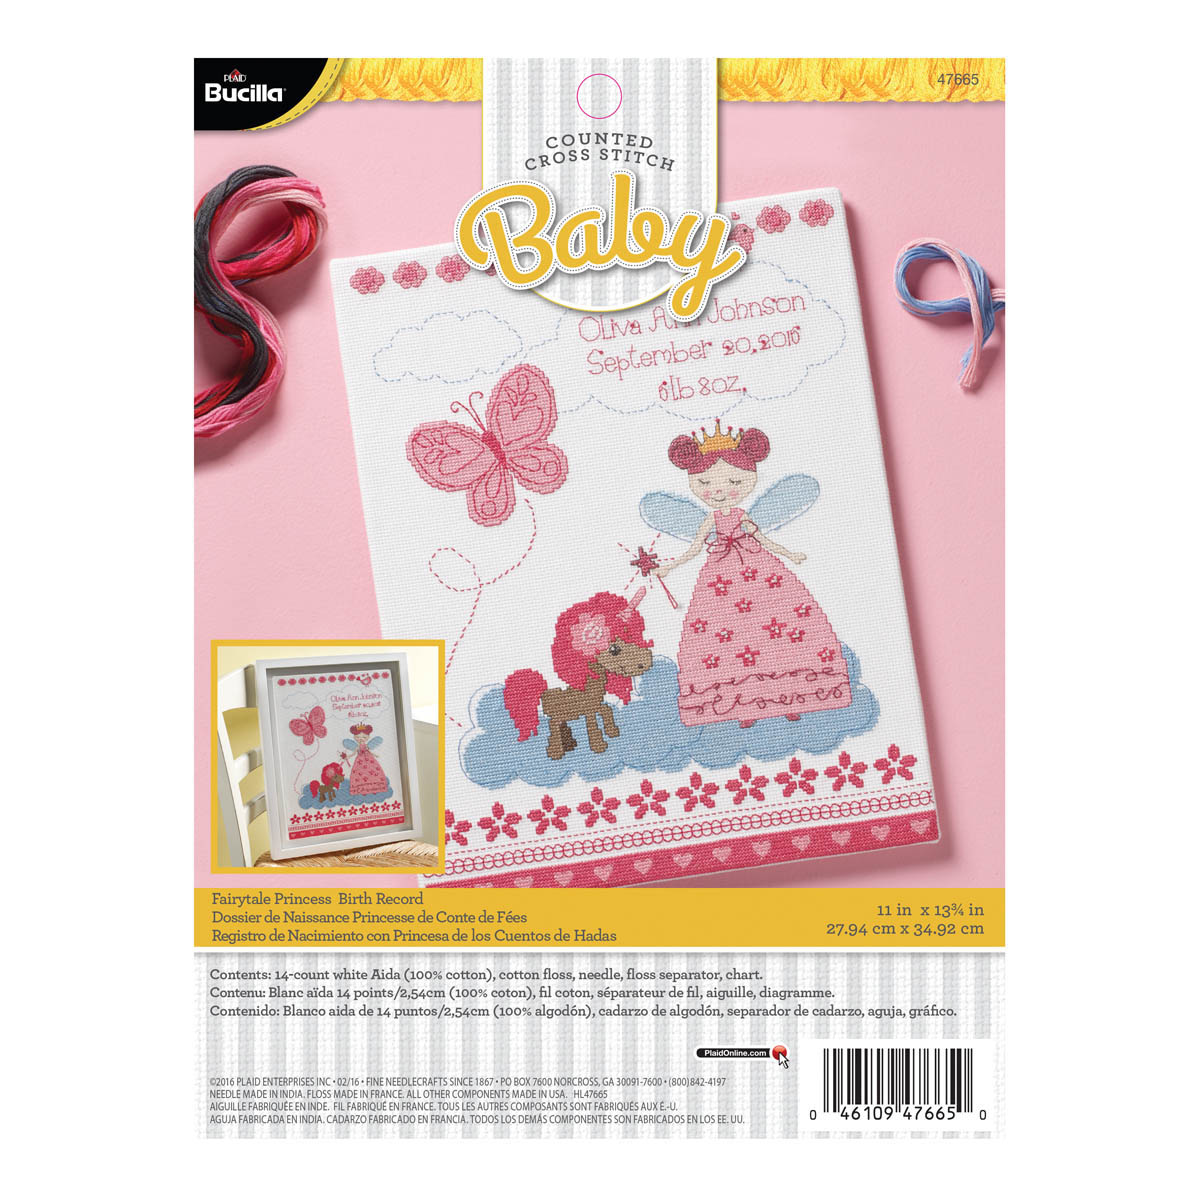 Bucilla ® Baby - Counted Cross Stitch - Crib Ensembles - Fairytale Princess - Birth Record Kit - 476